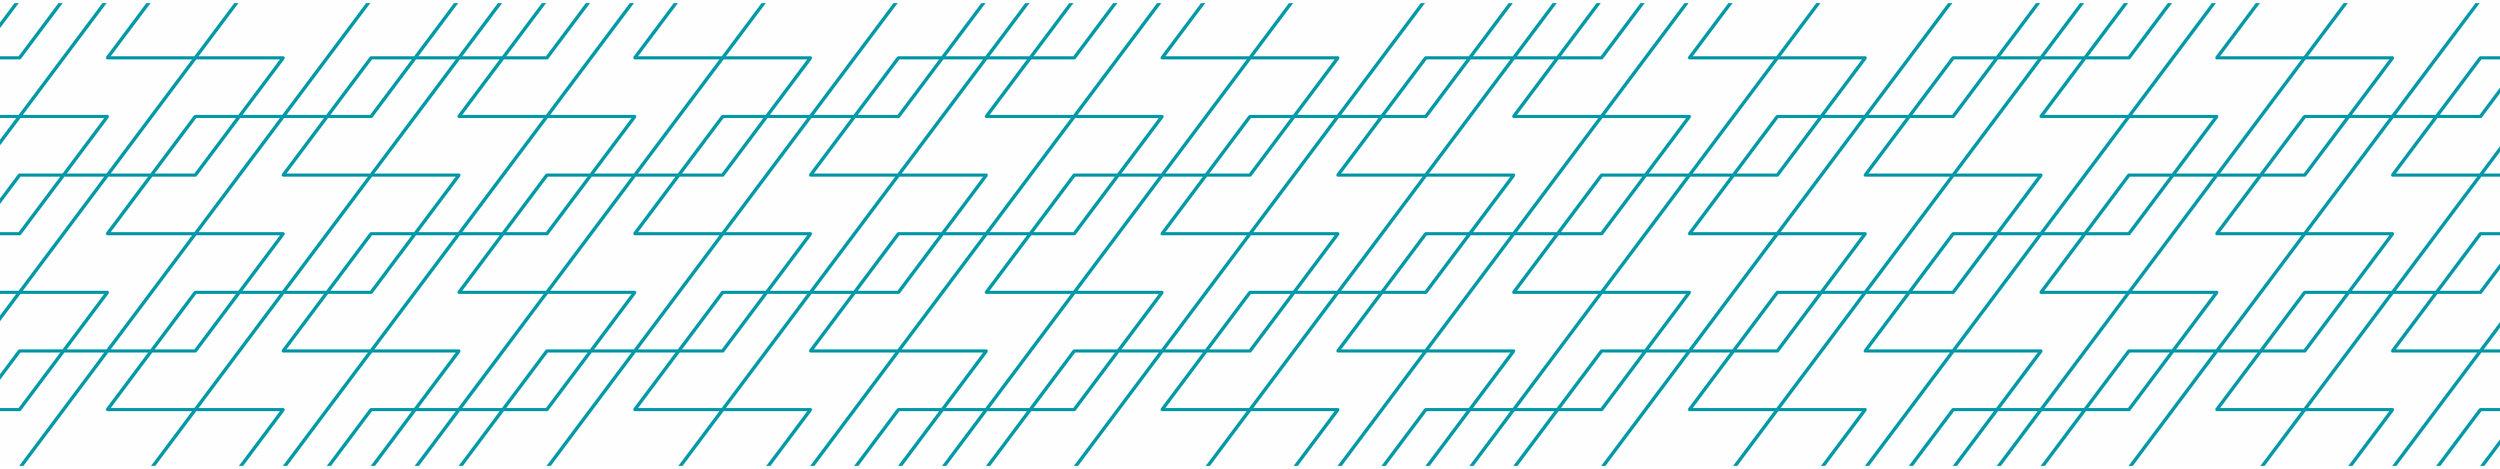 coa-pattern_06@2x.jpg